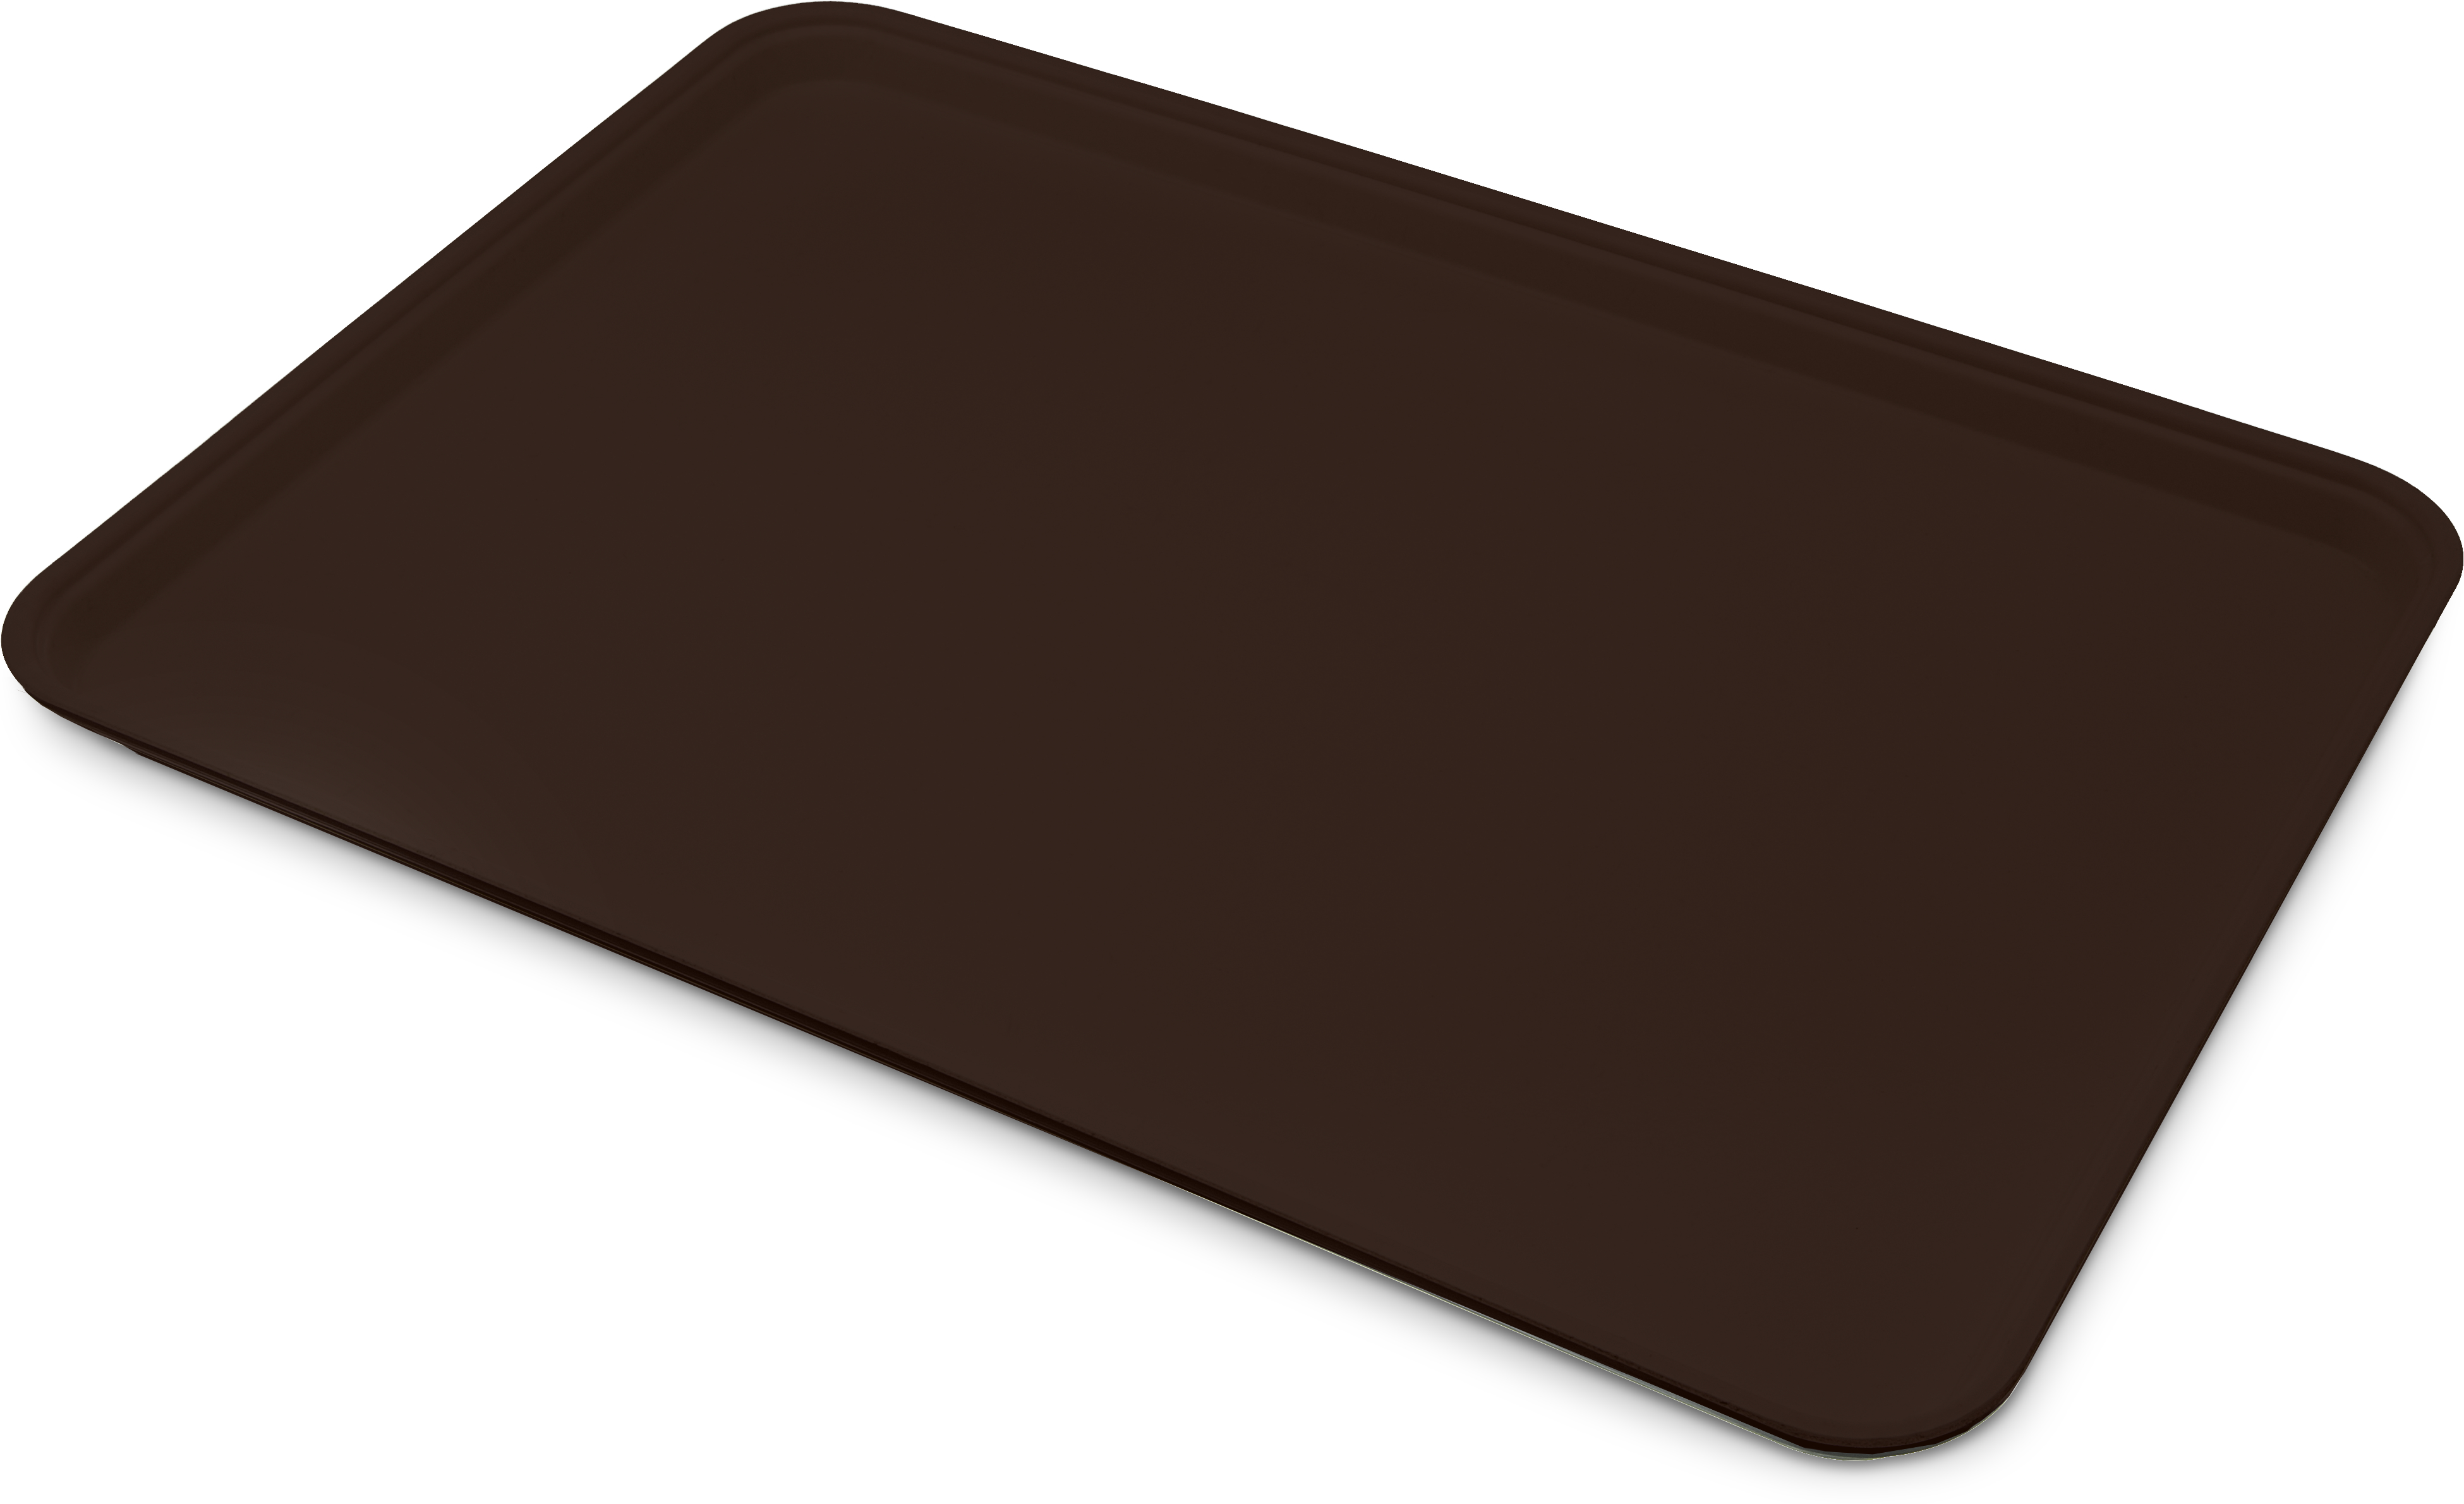 Glasteel Tray Display/Bakery 17.9 x 25.6 - Chocolate